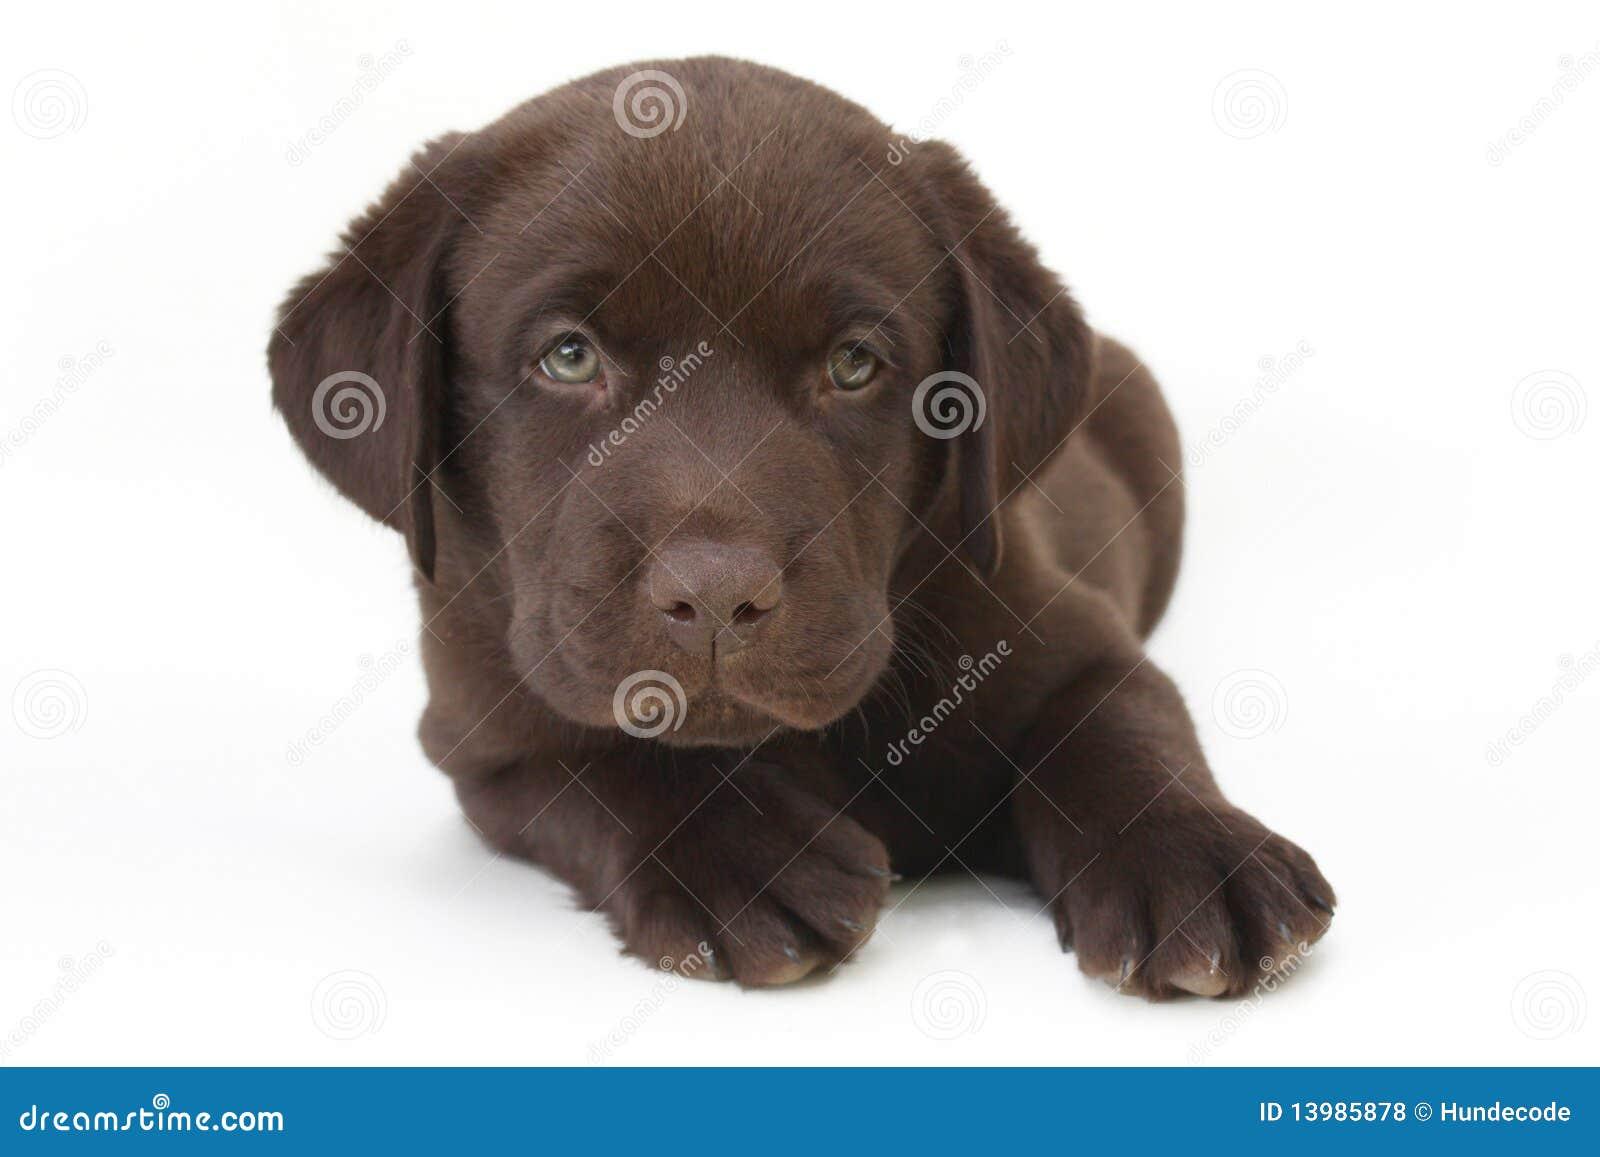 Chocolate labrador retriever puppy with green eyes